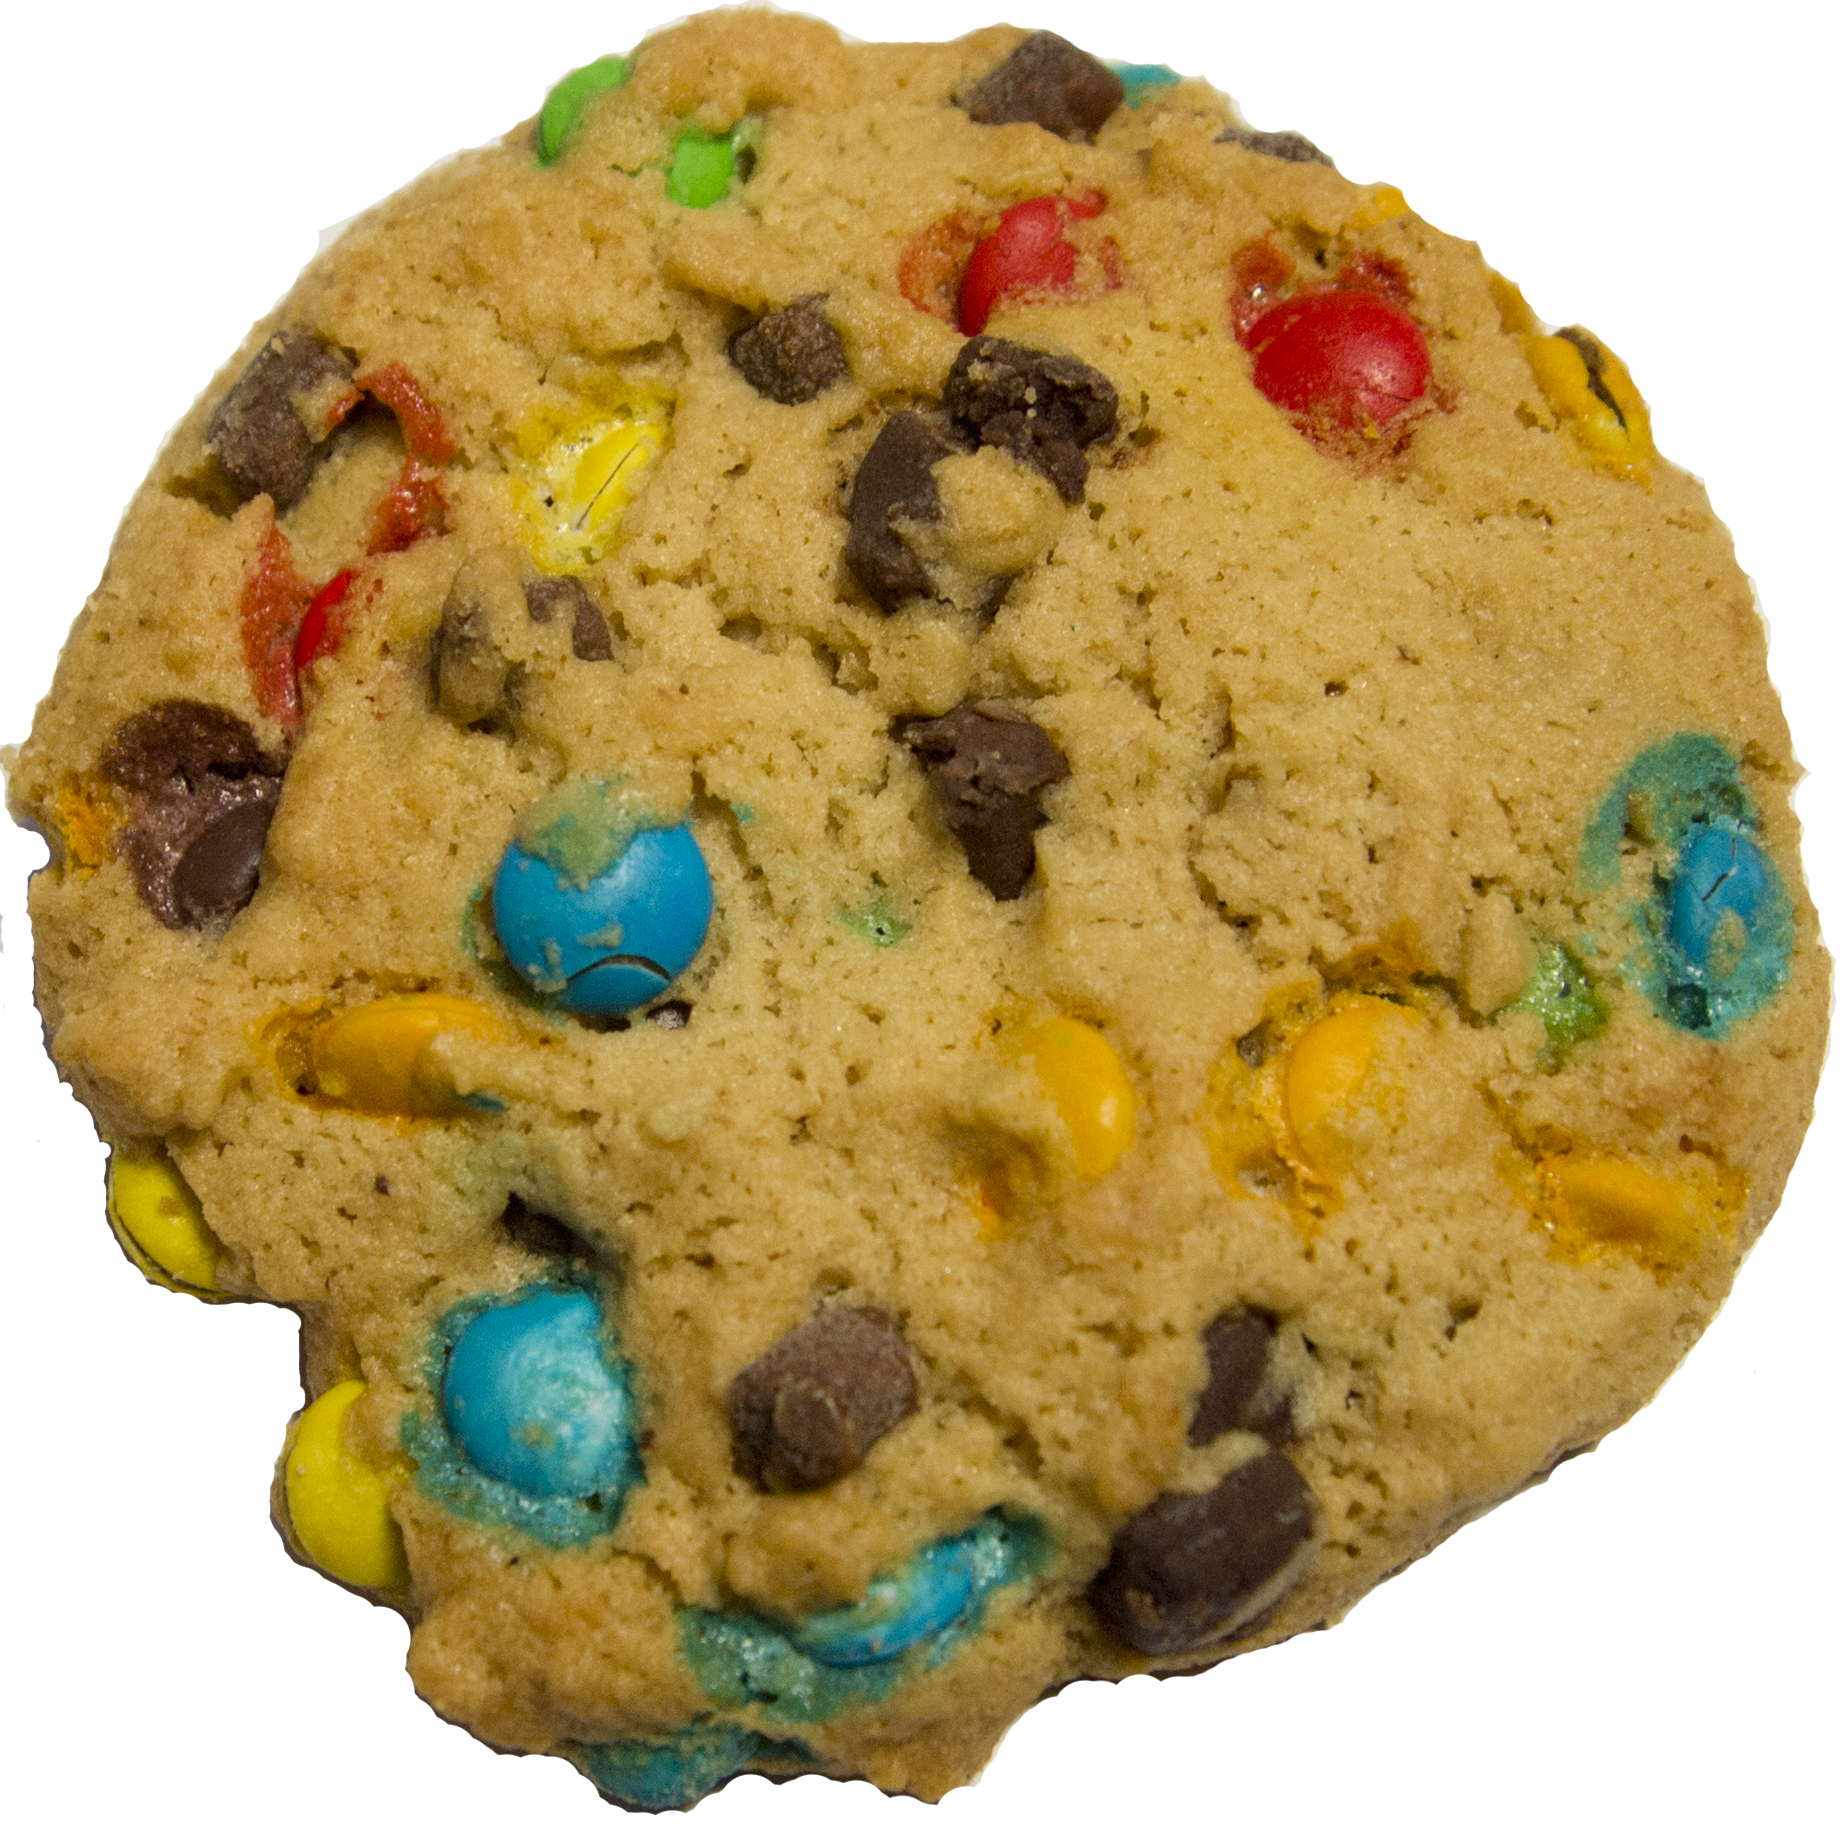 File:Cookie.png - Cookie PNG